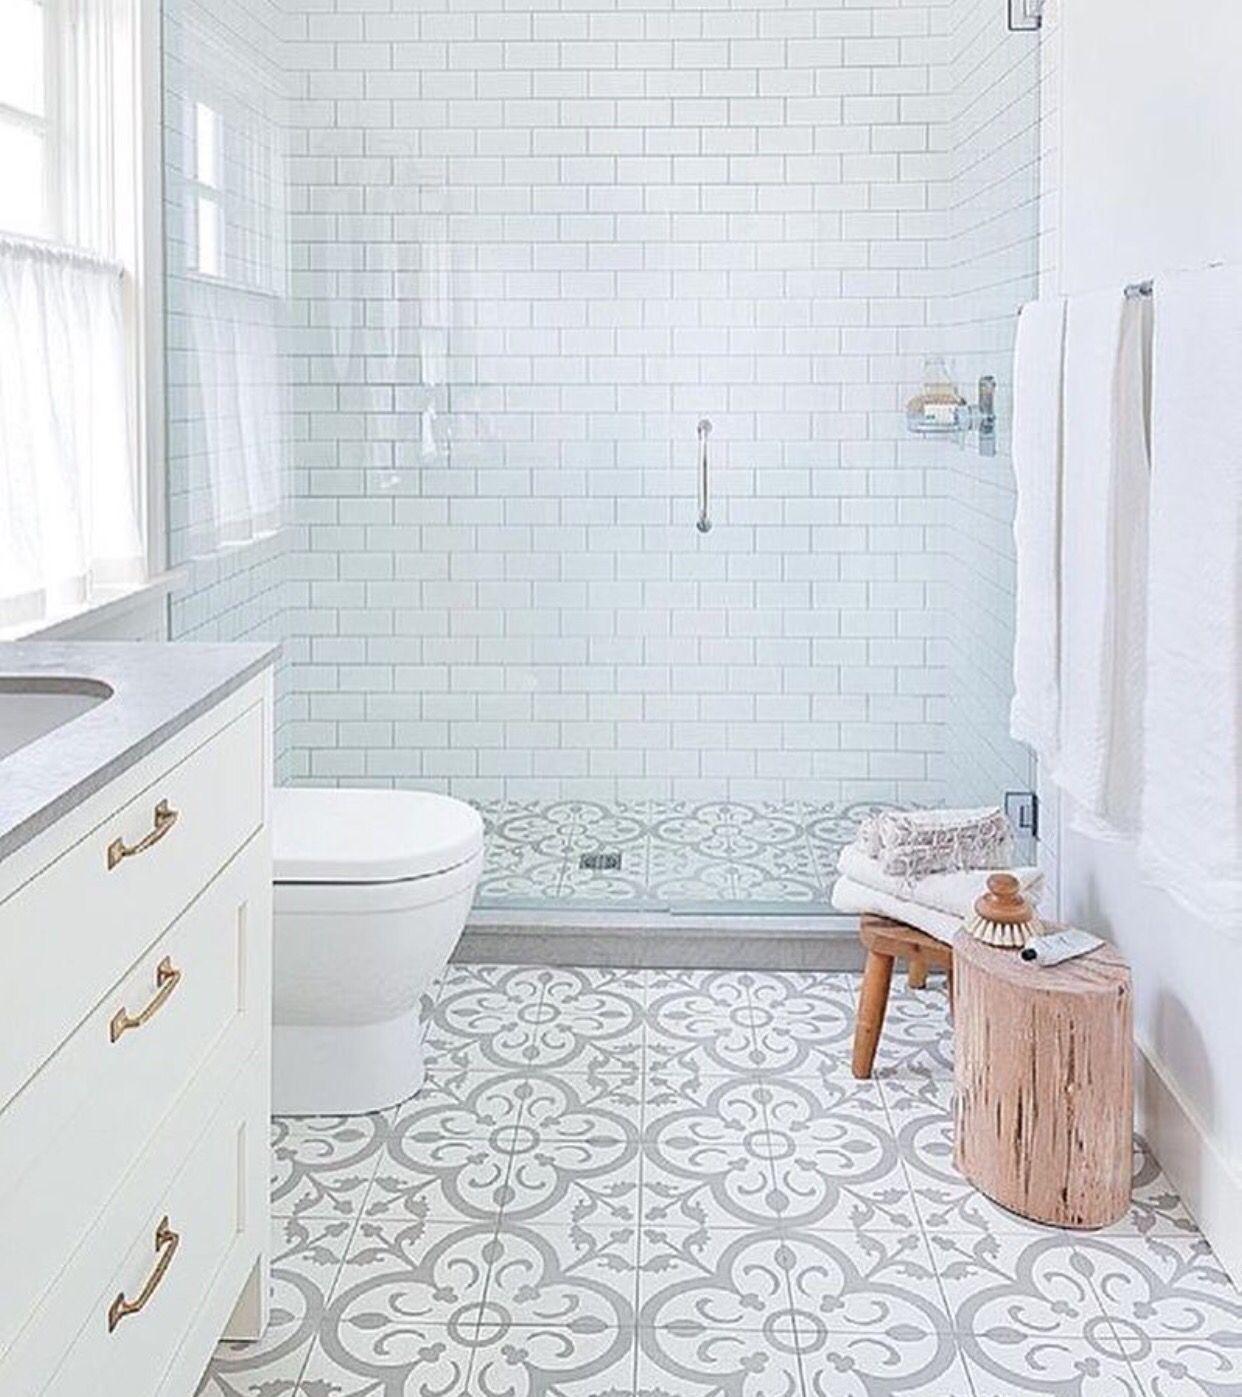 Banheiro clean, moderno, com metro white | Homestyle | Pinterest ...